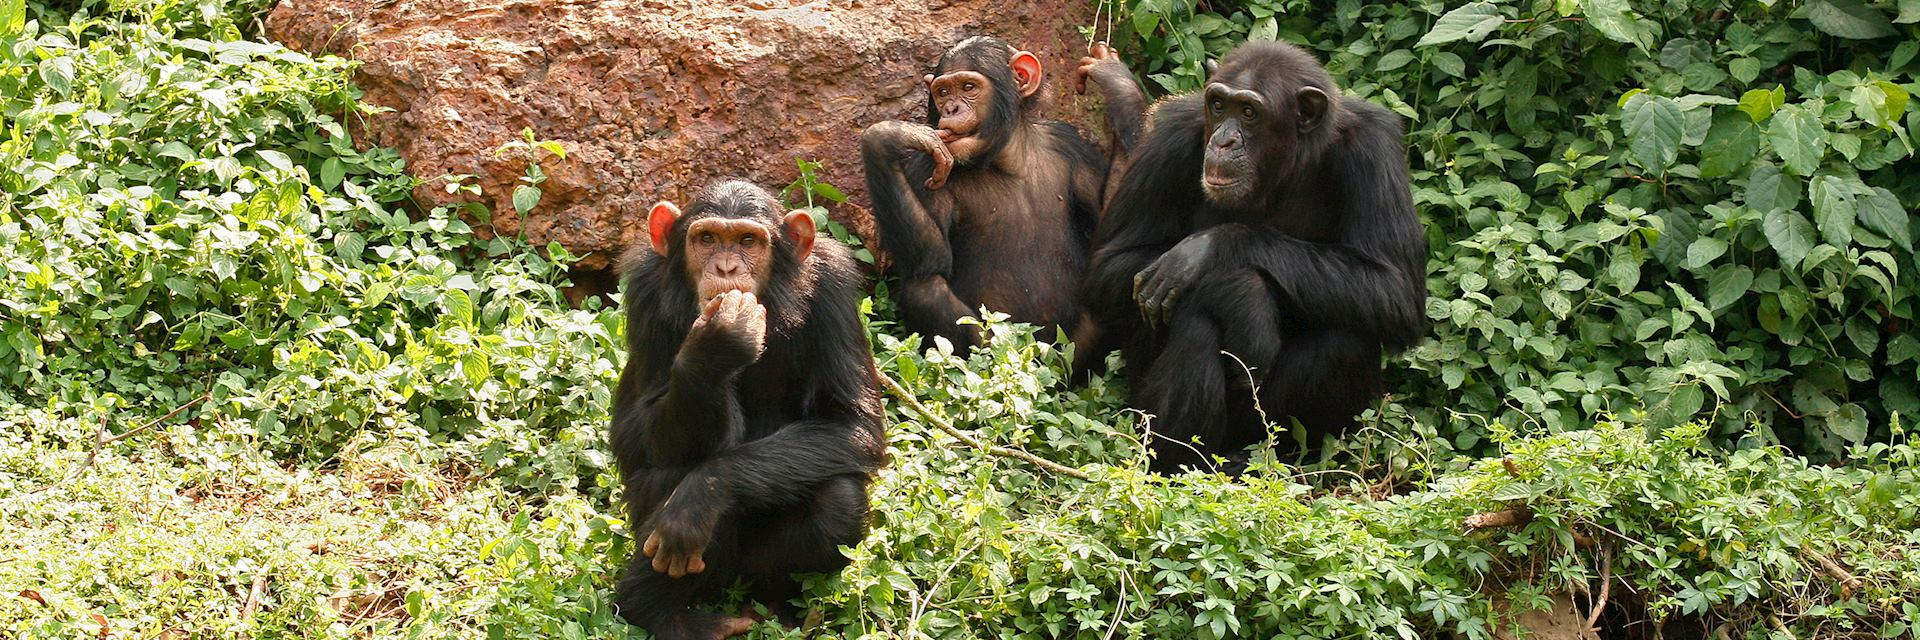 Chimpanzee, Kibale Forest National Park